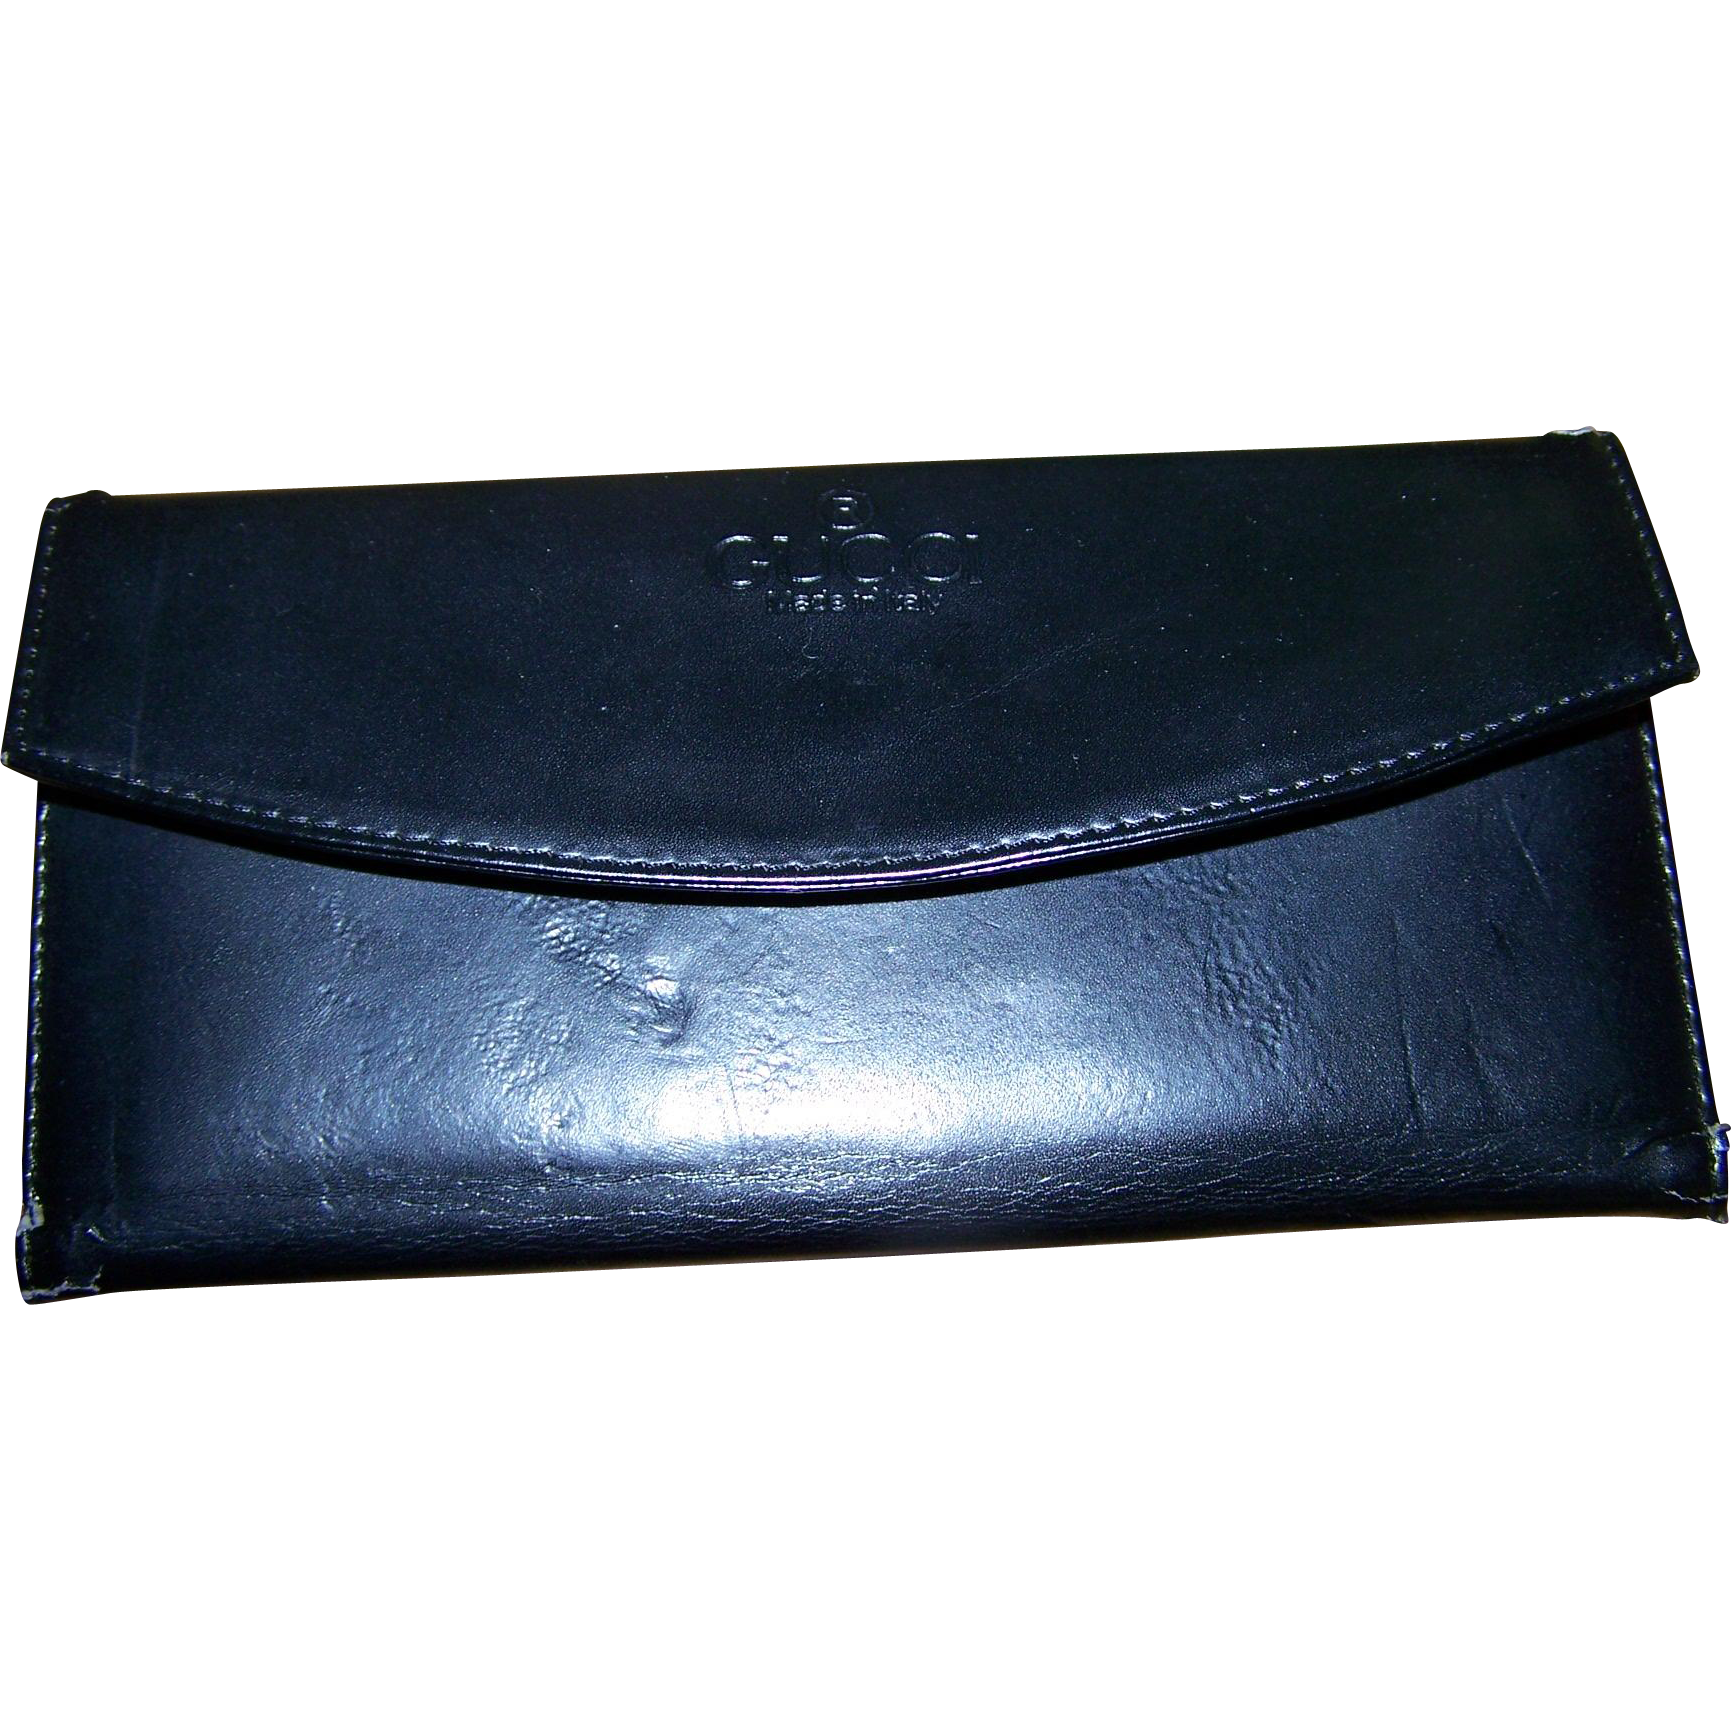 Genty USed Vintage Black Leather Designer GUCCI Ladies Fashion Wallet